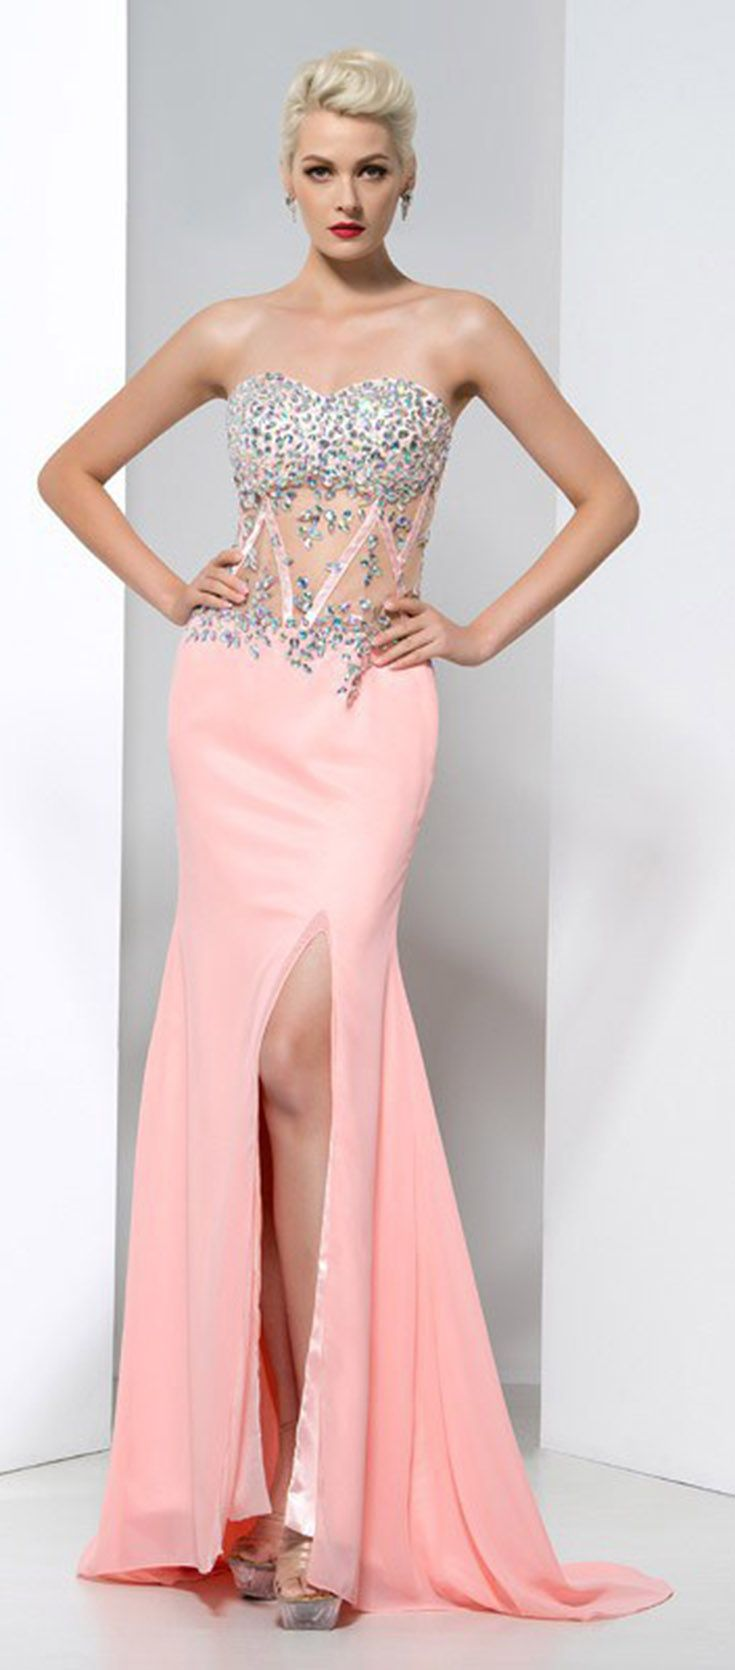 Mejores 80 imágenes de Pink Prom Dresses en Pinterest | Vestidos de ...